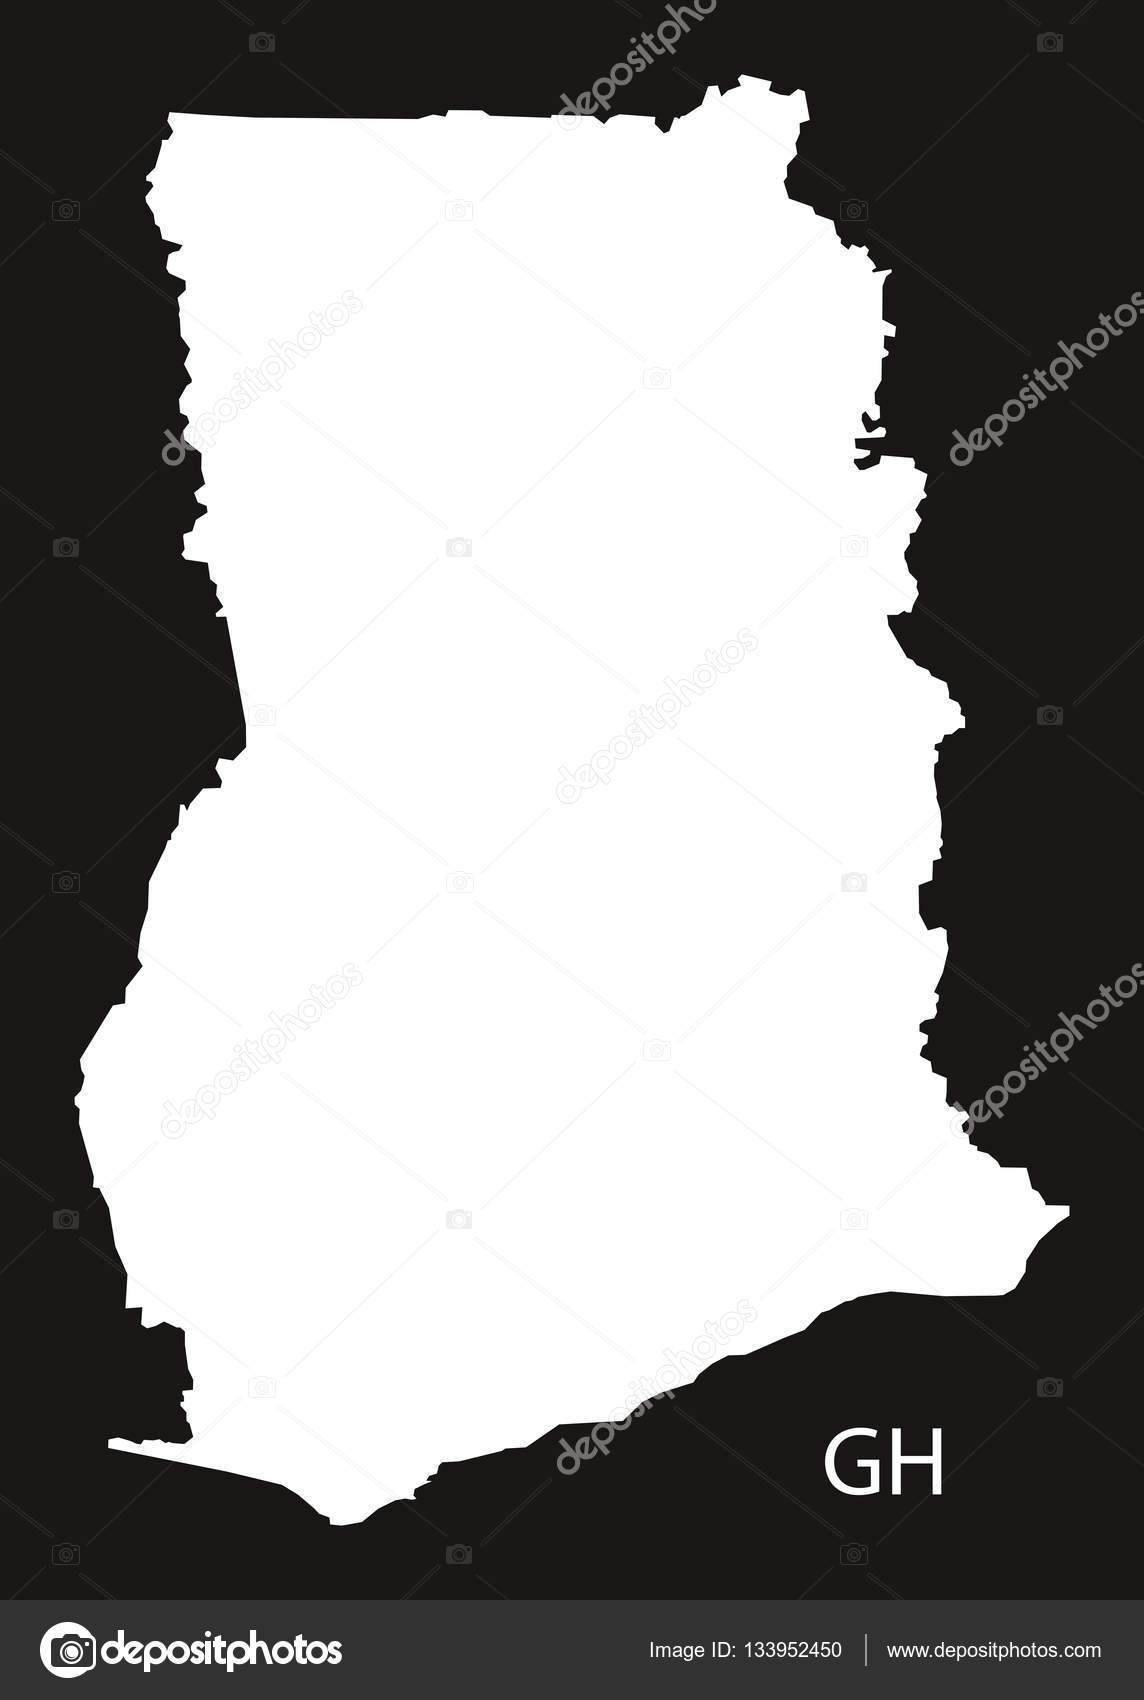 Ghana Karte.Ghana Karte Schwarz Weiss Stockvektor C Ingomenhard